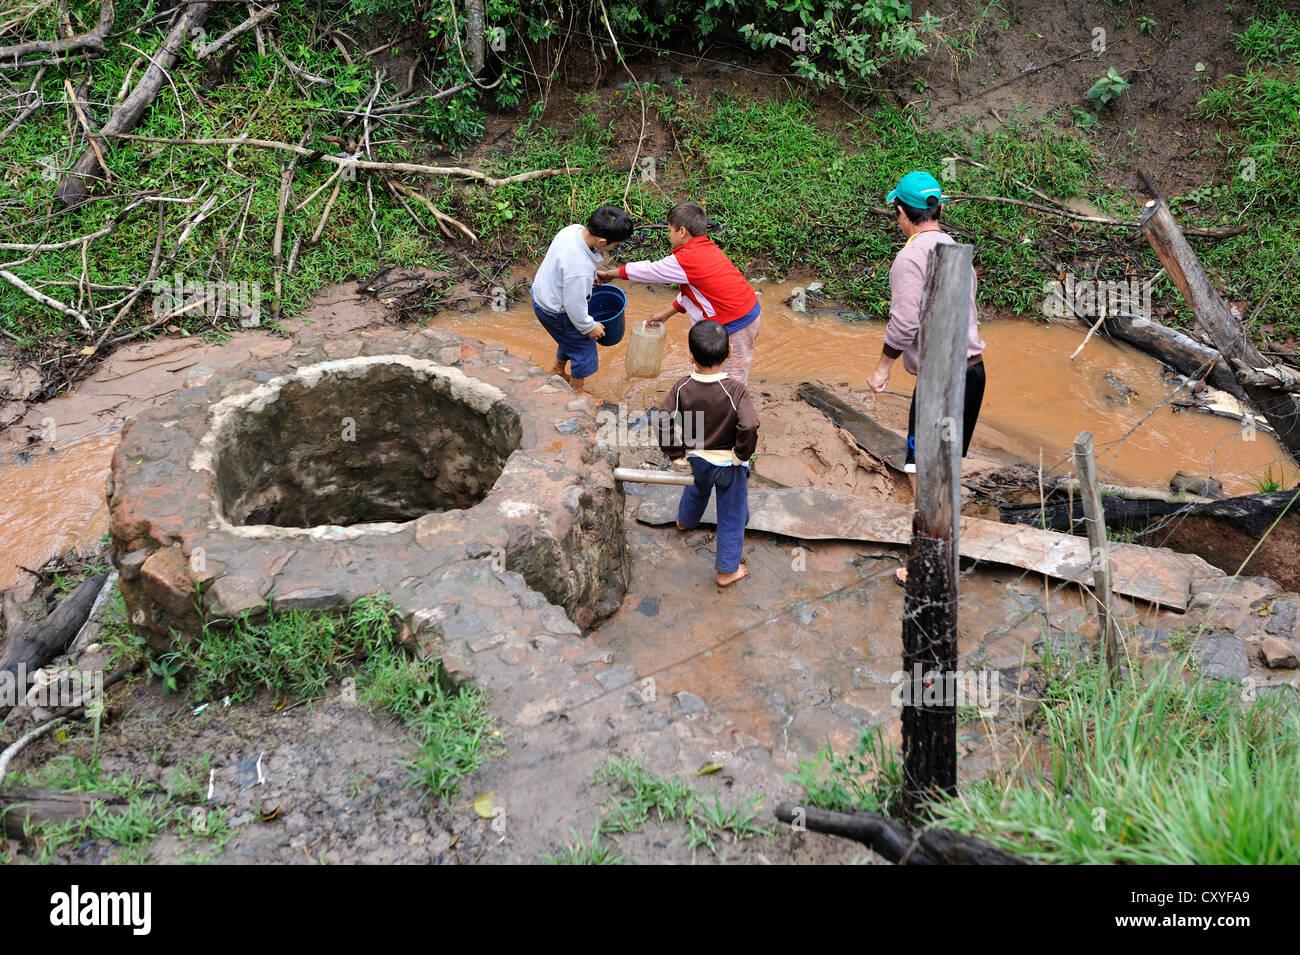 Children collecting water from a muddy creek, Comunida Martillo, Caaguazu, Paraguay, South America - Stock Image